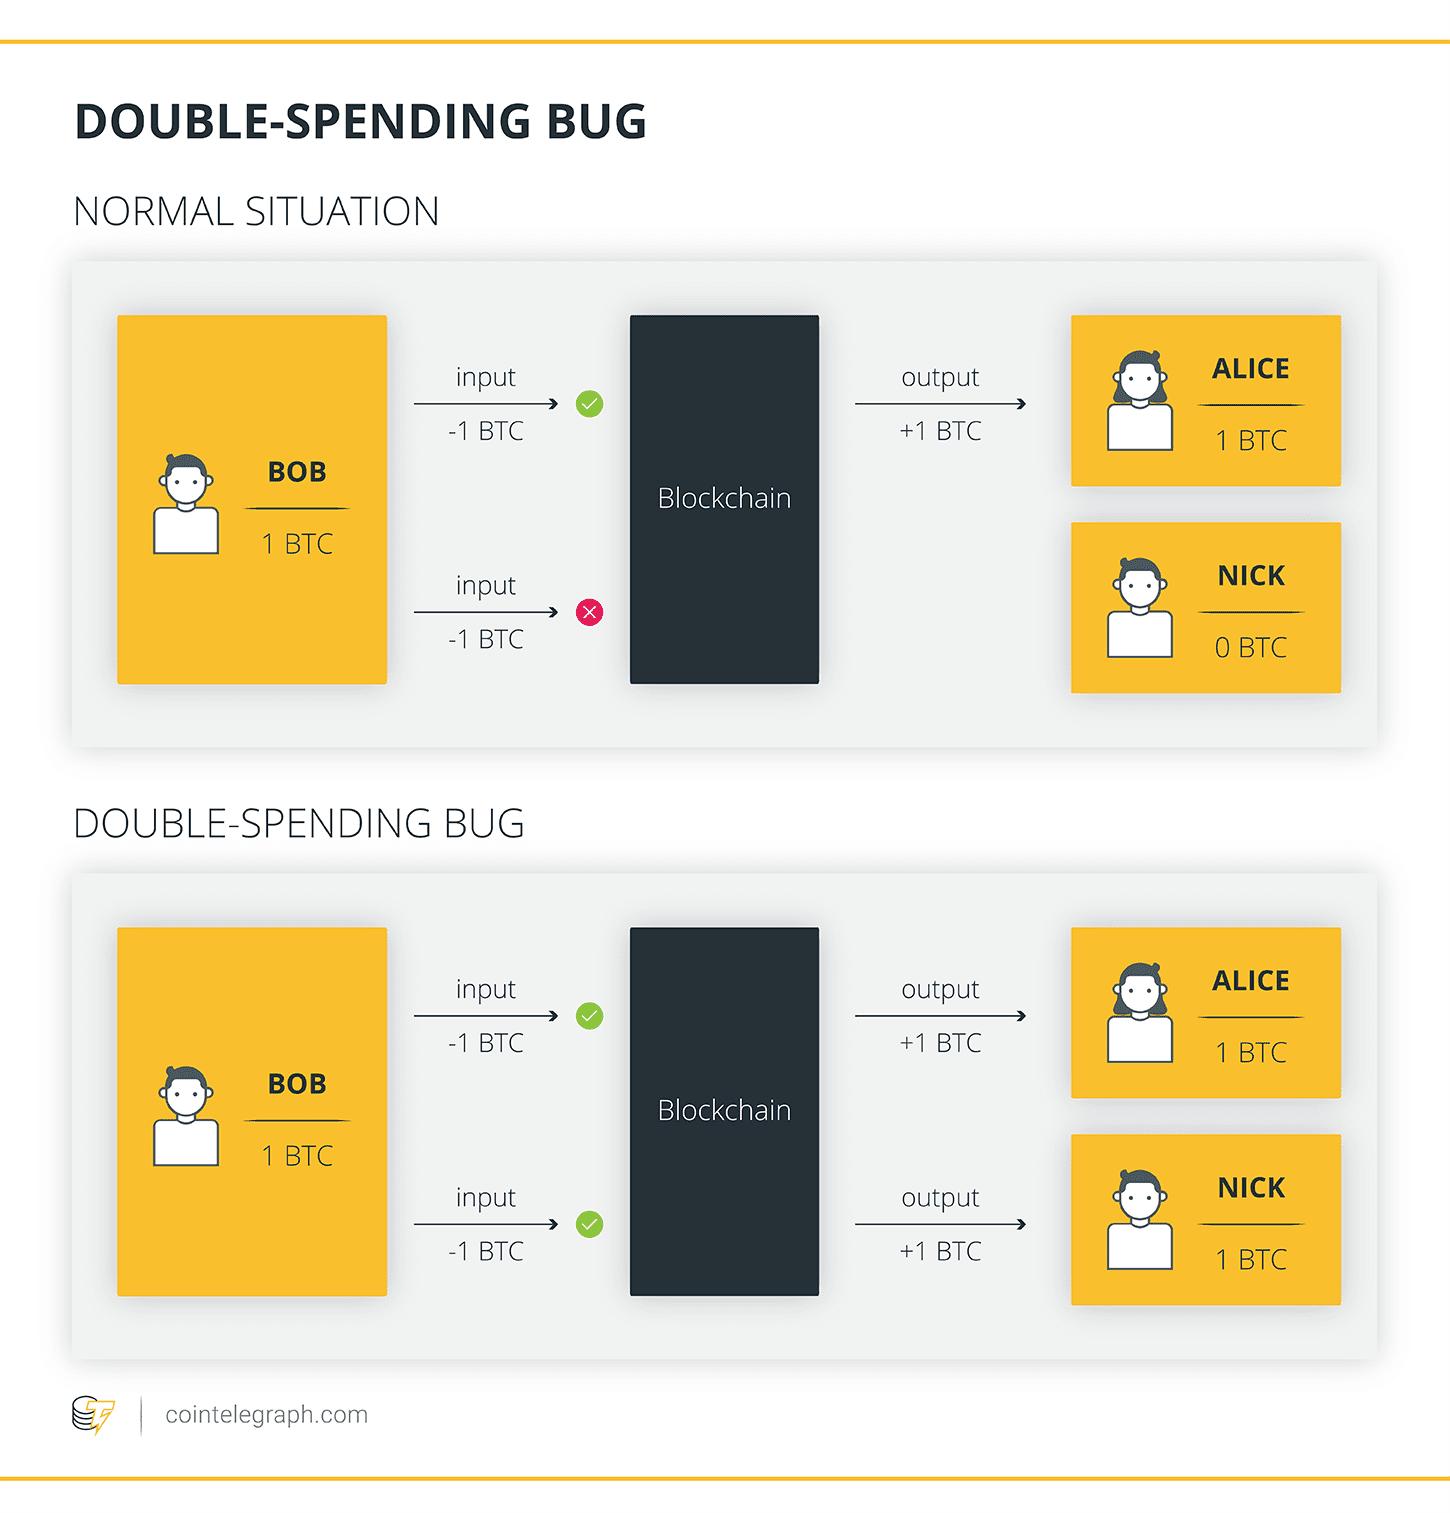 Double-spending bug